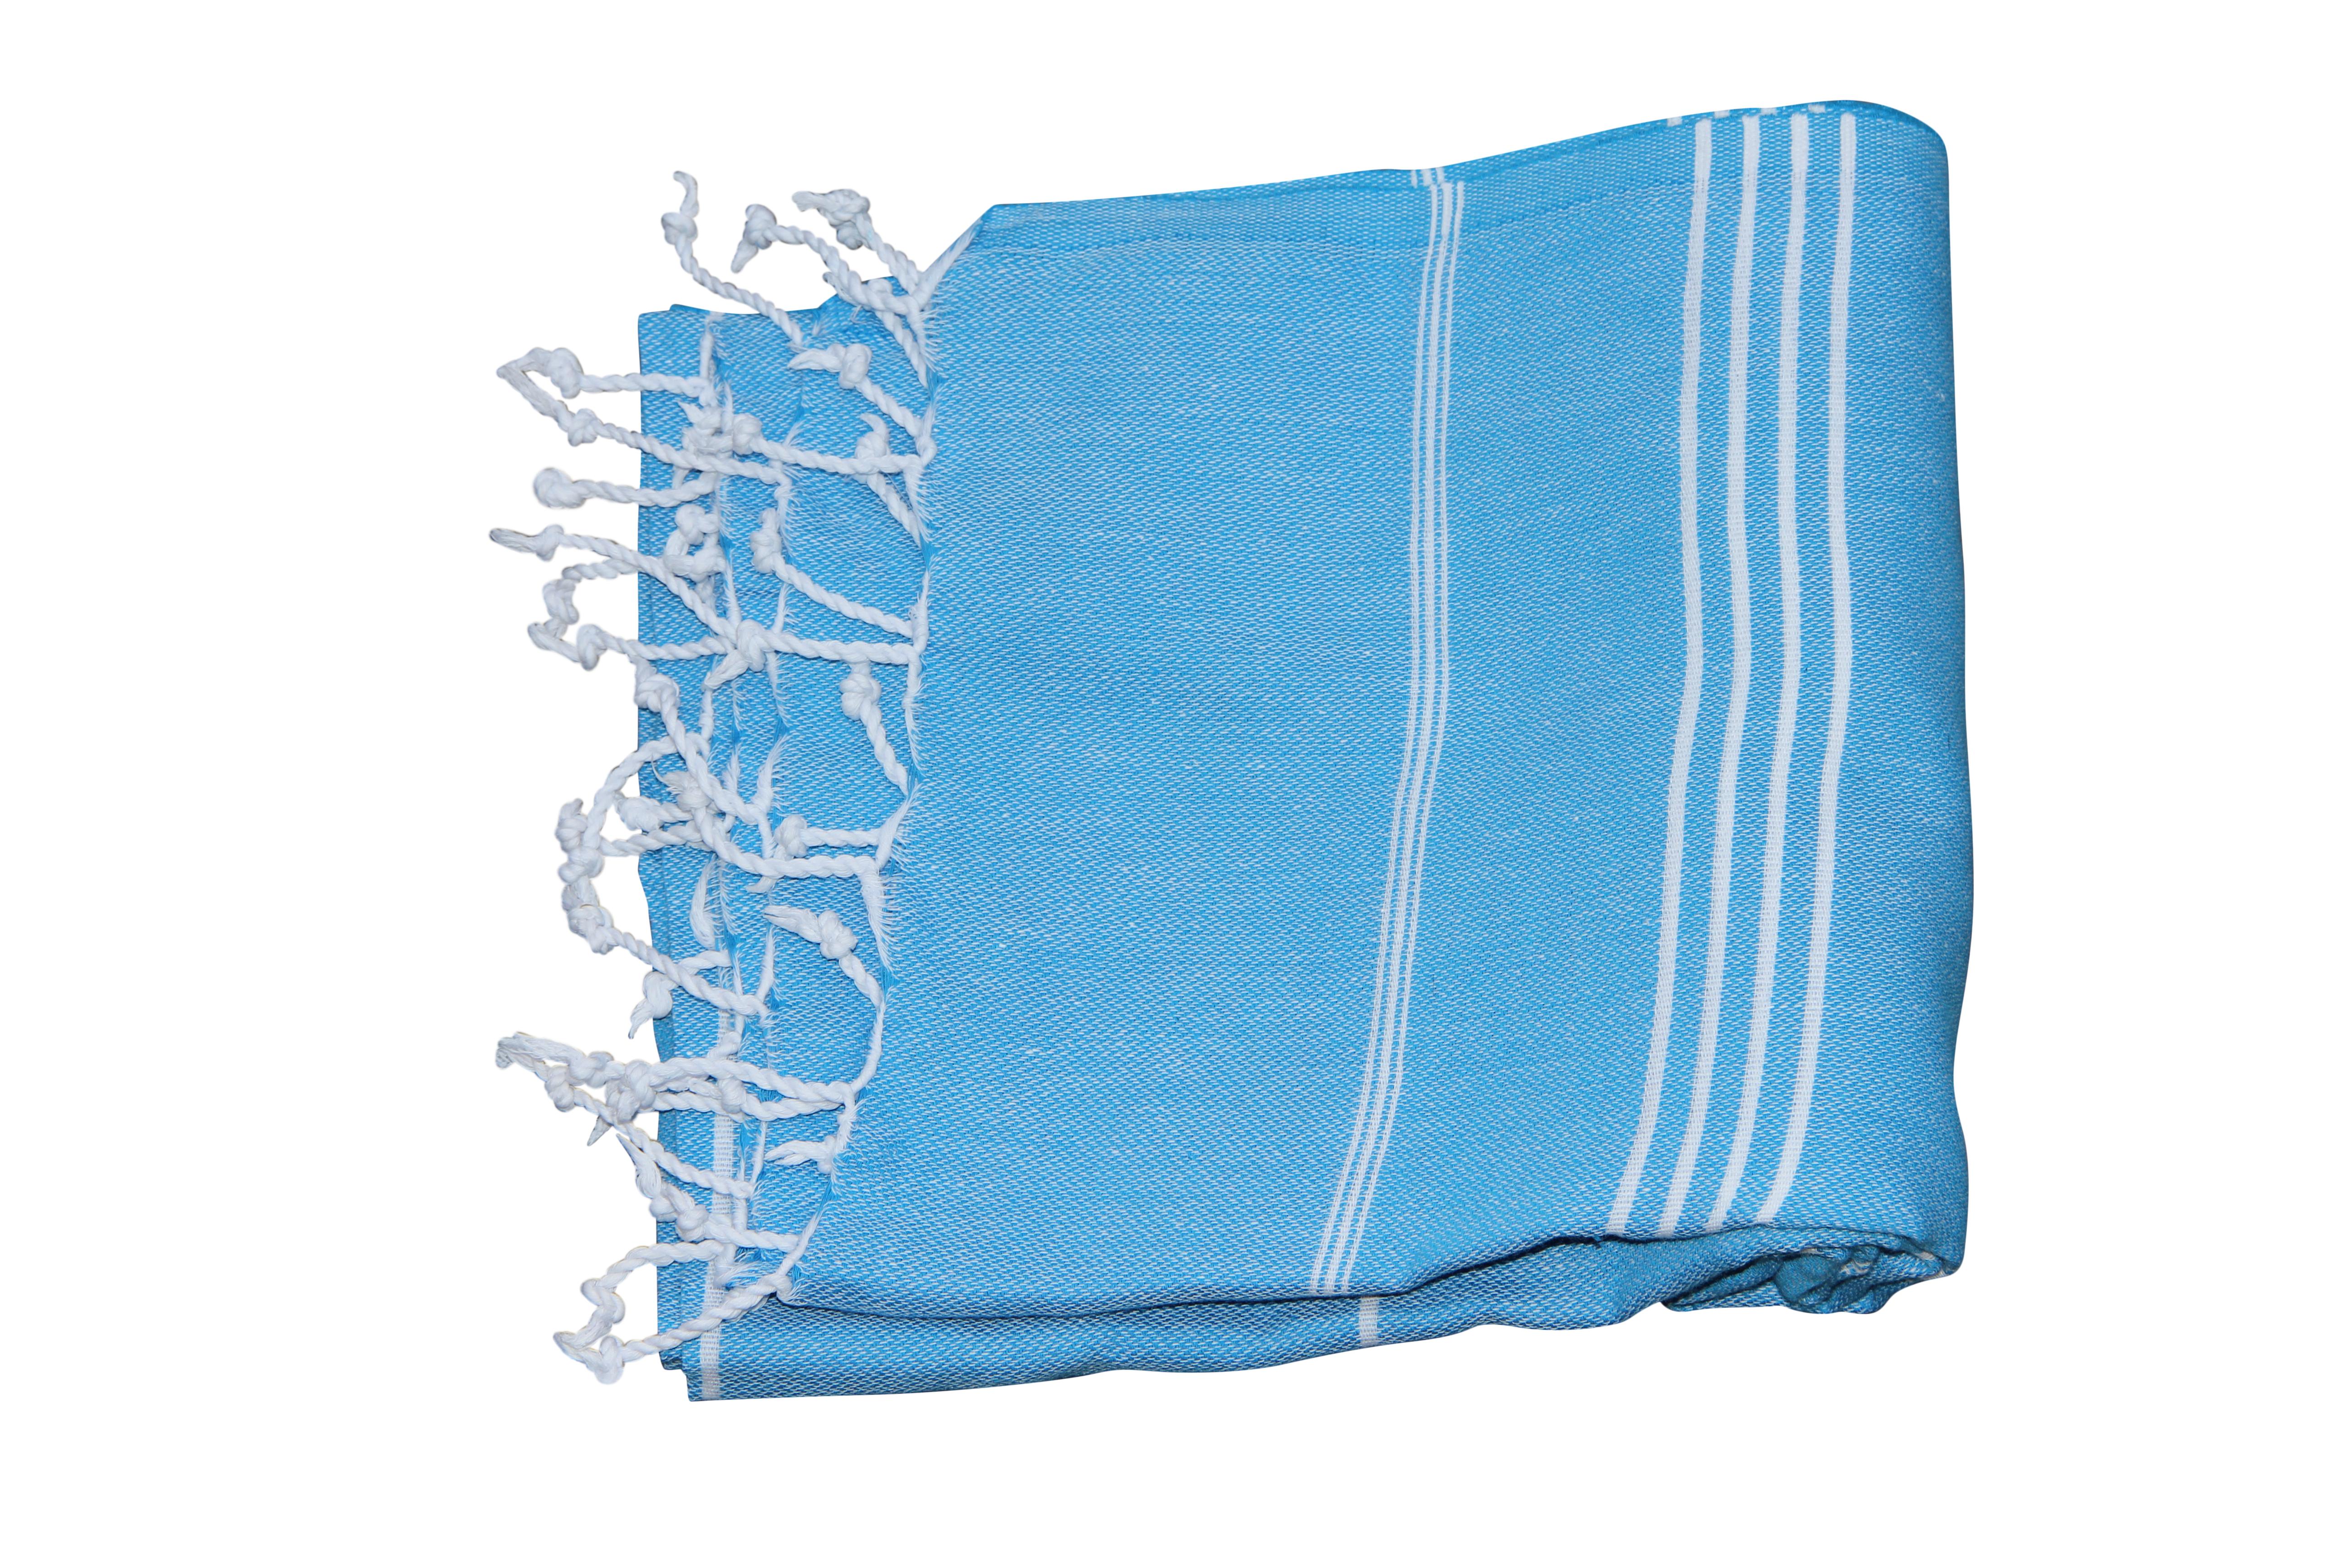 hamamdoek aquablauw